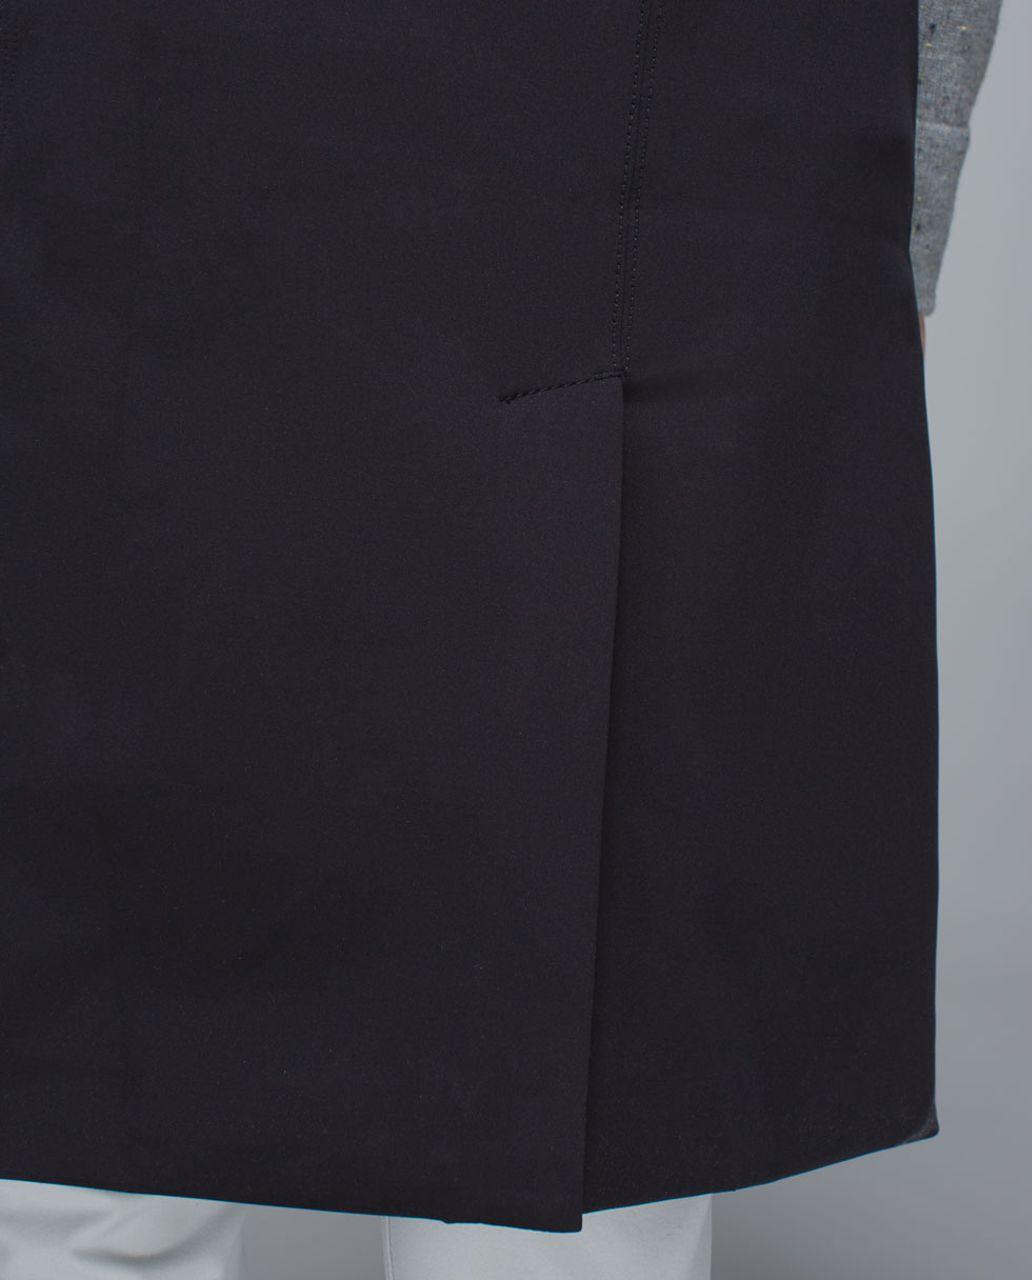 Lululemon Quickchange Vest - Black